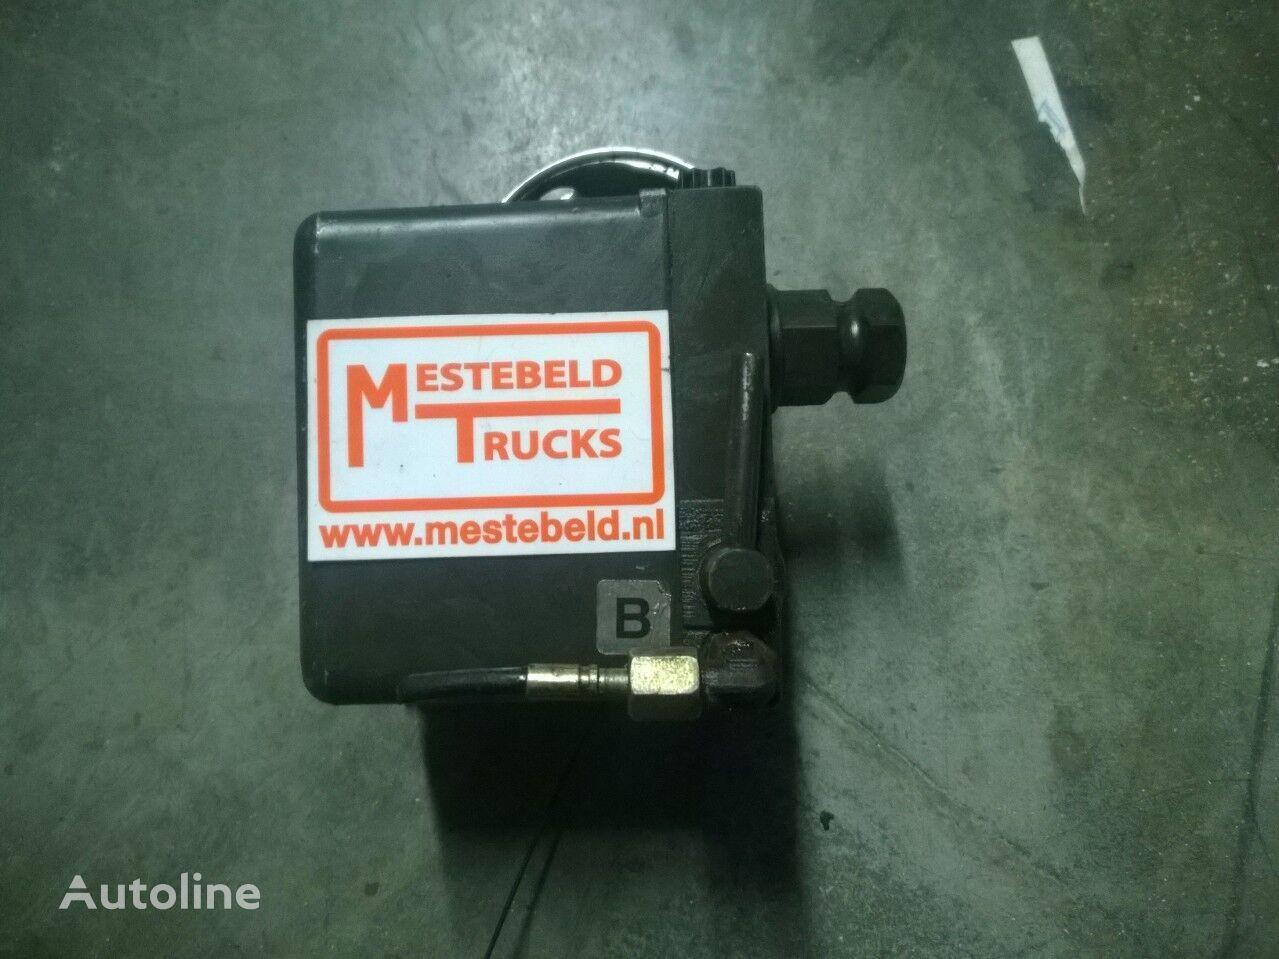 pompa di elevazione cabina MERCEDES-BENZ per trattore stradale MERCEDES-BENZ Cabinekantelpomp Actros